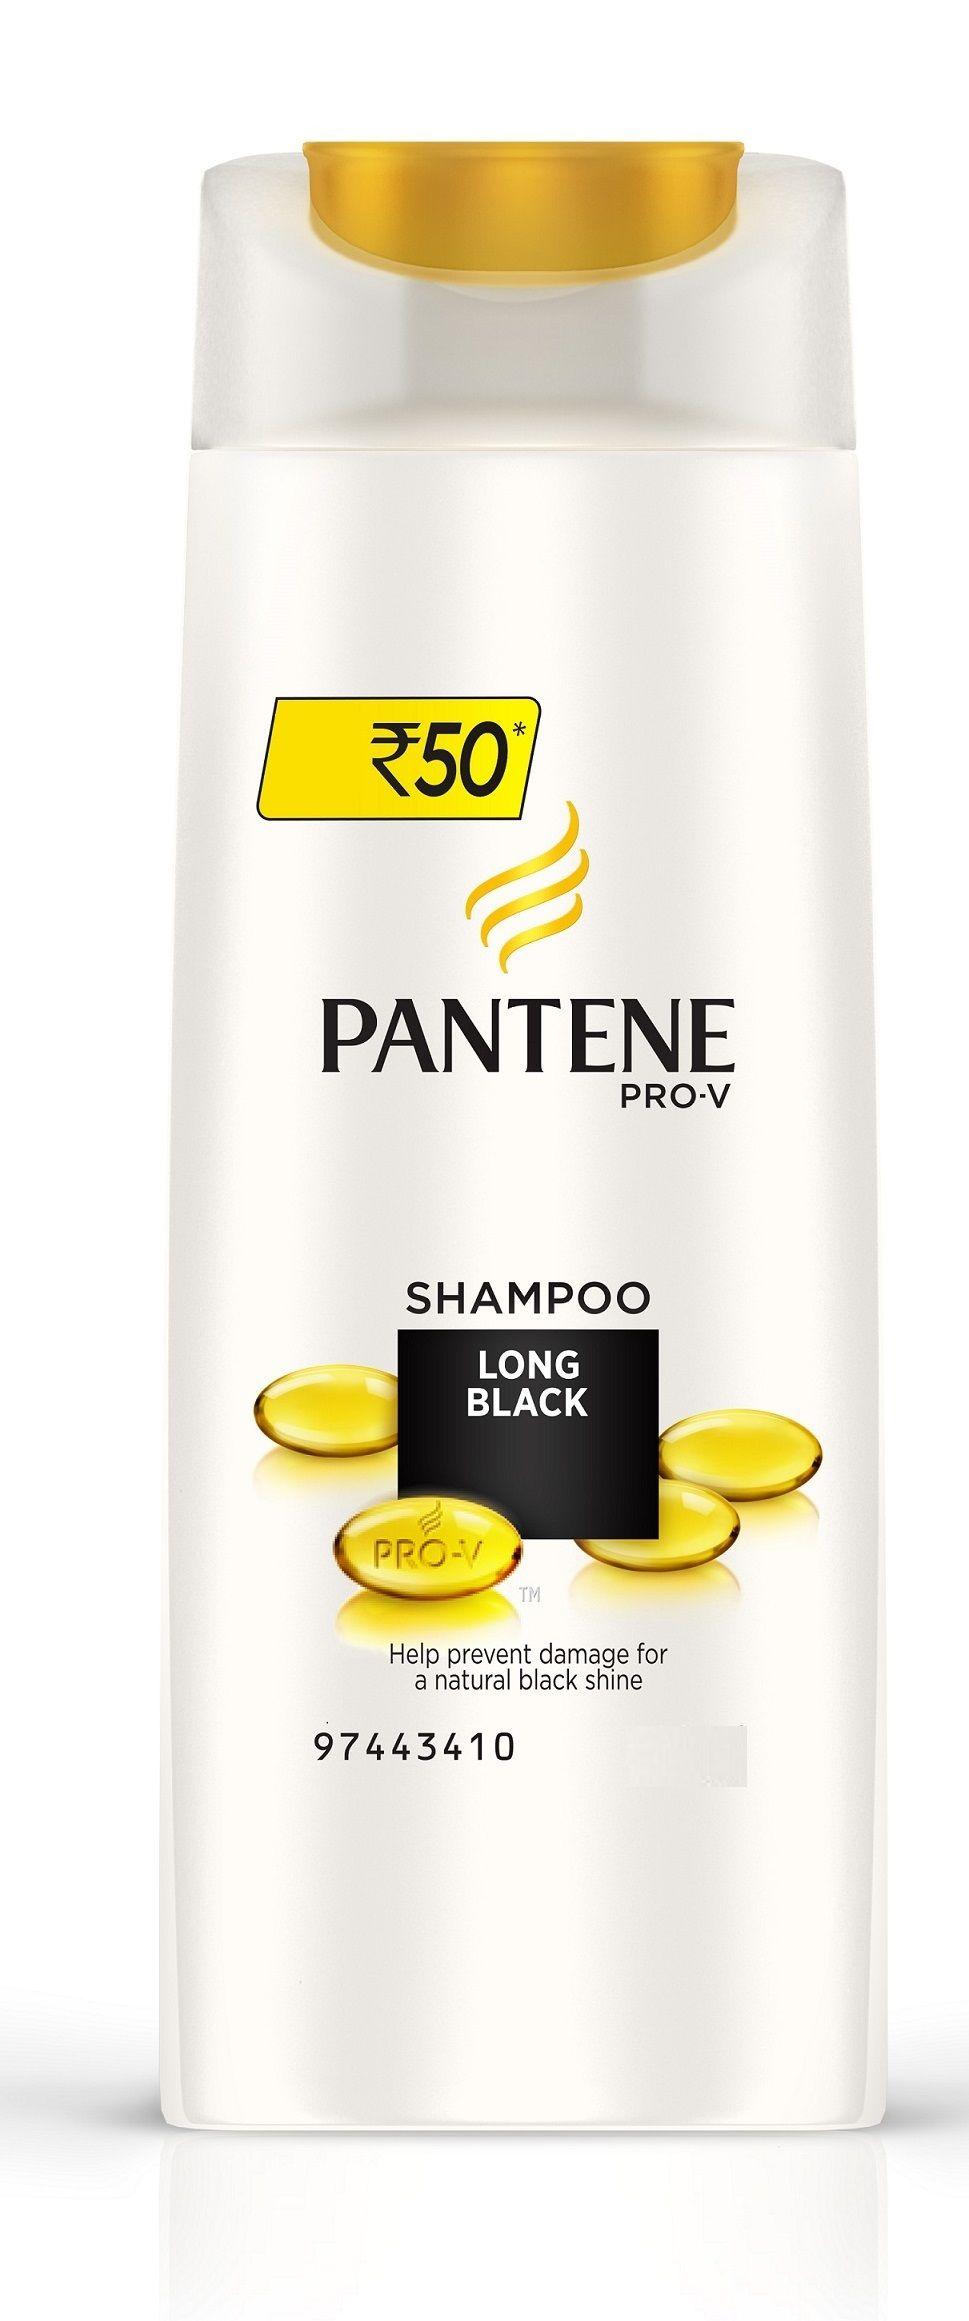 Pantene Long Black Shampoo (340ml)